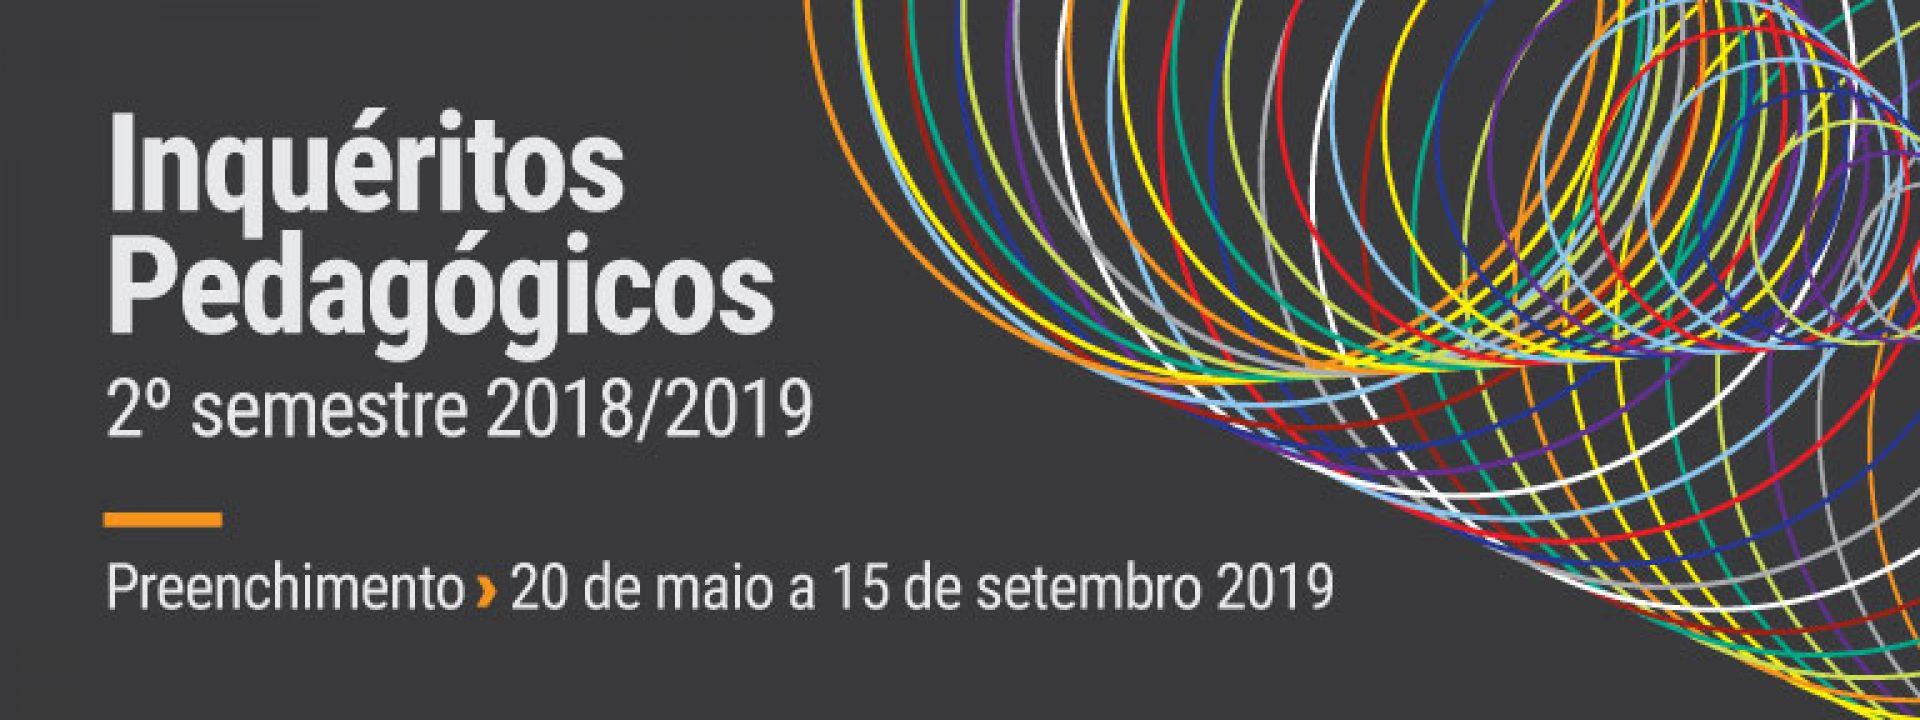 Preenchimento dos IPUPs 2 semestre 2018/2019